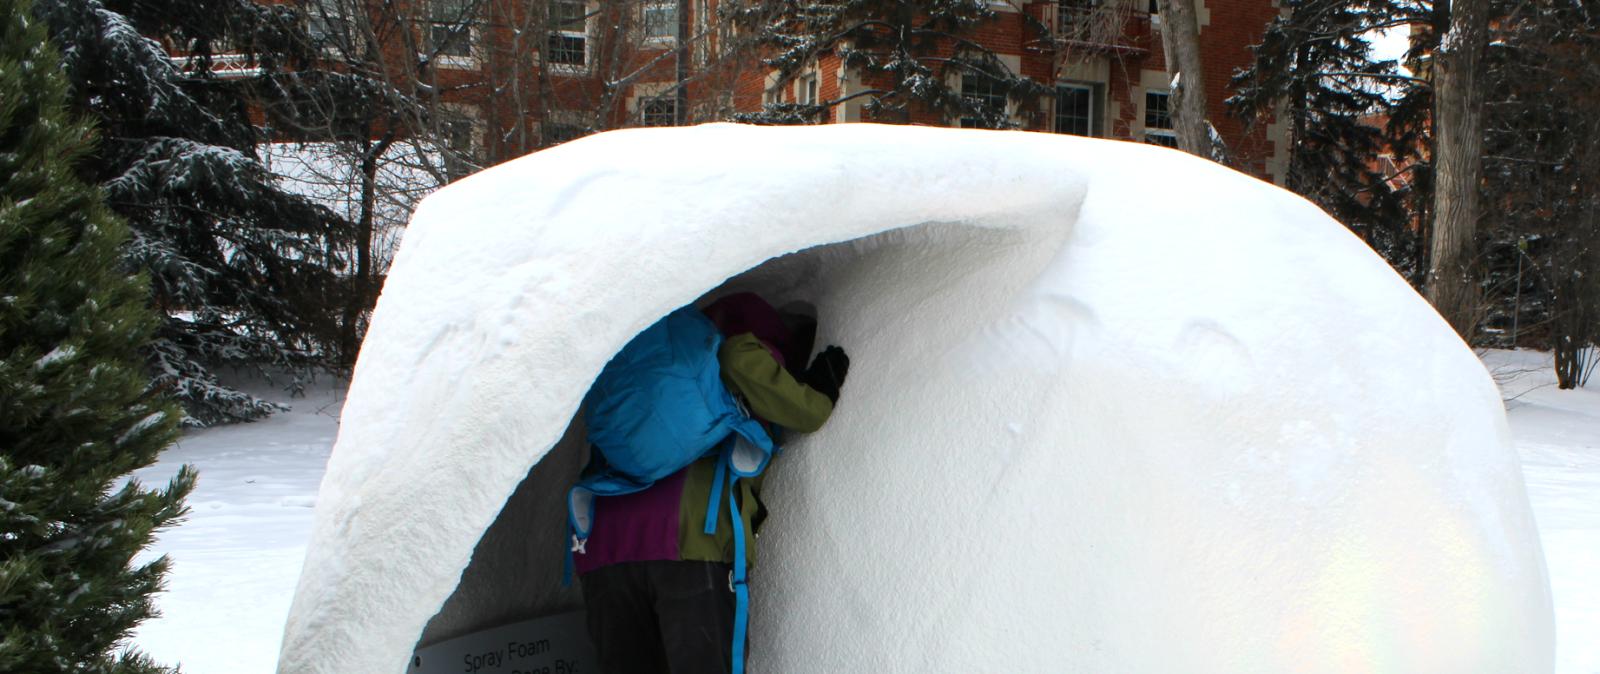 A Peak Inside a Snow Globe